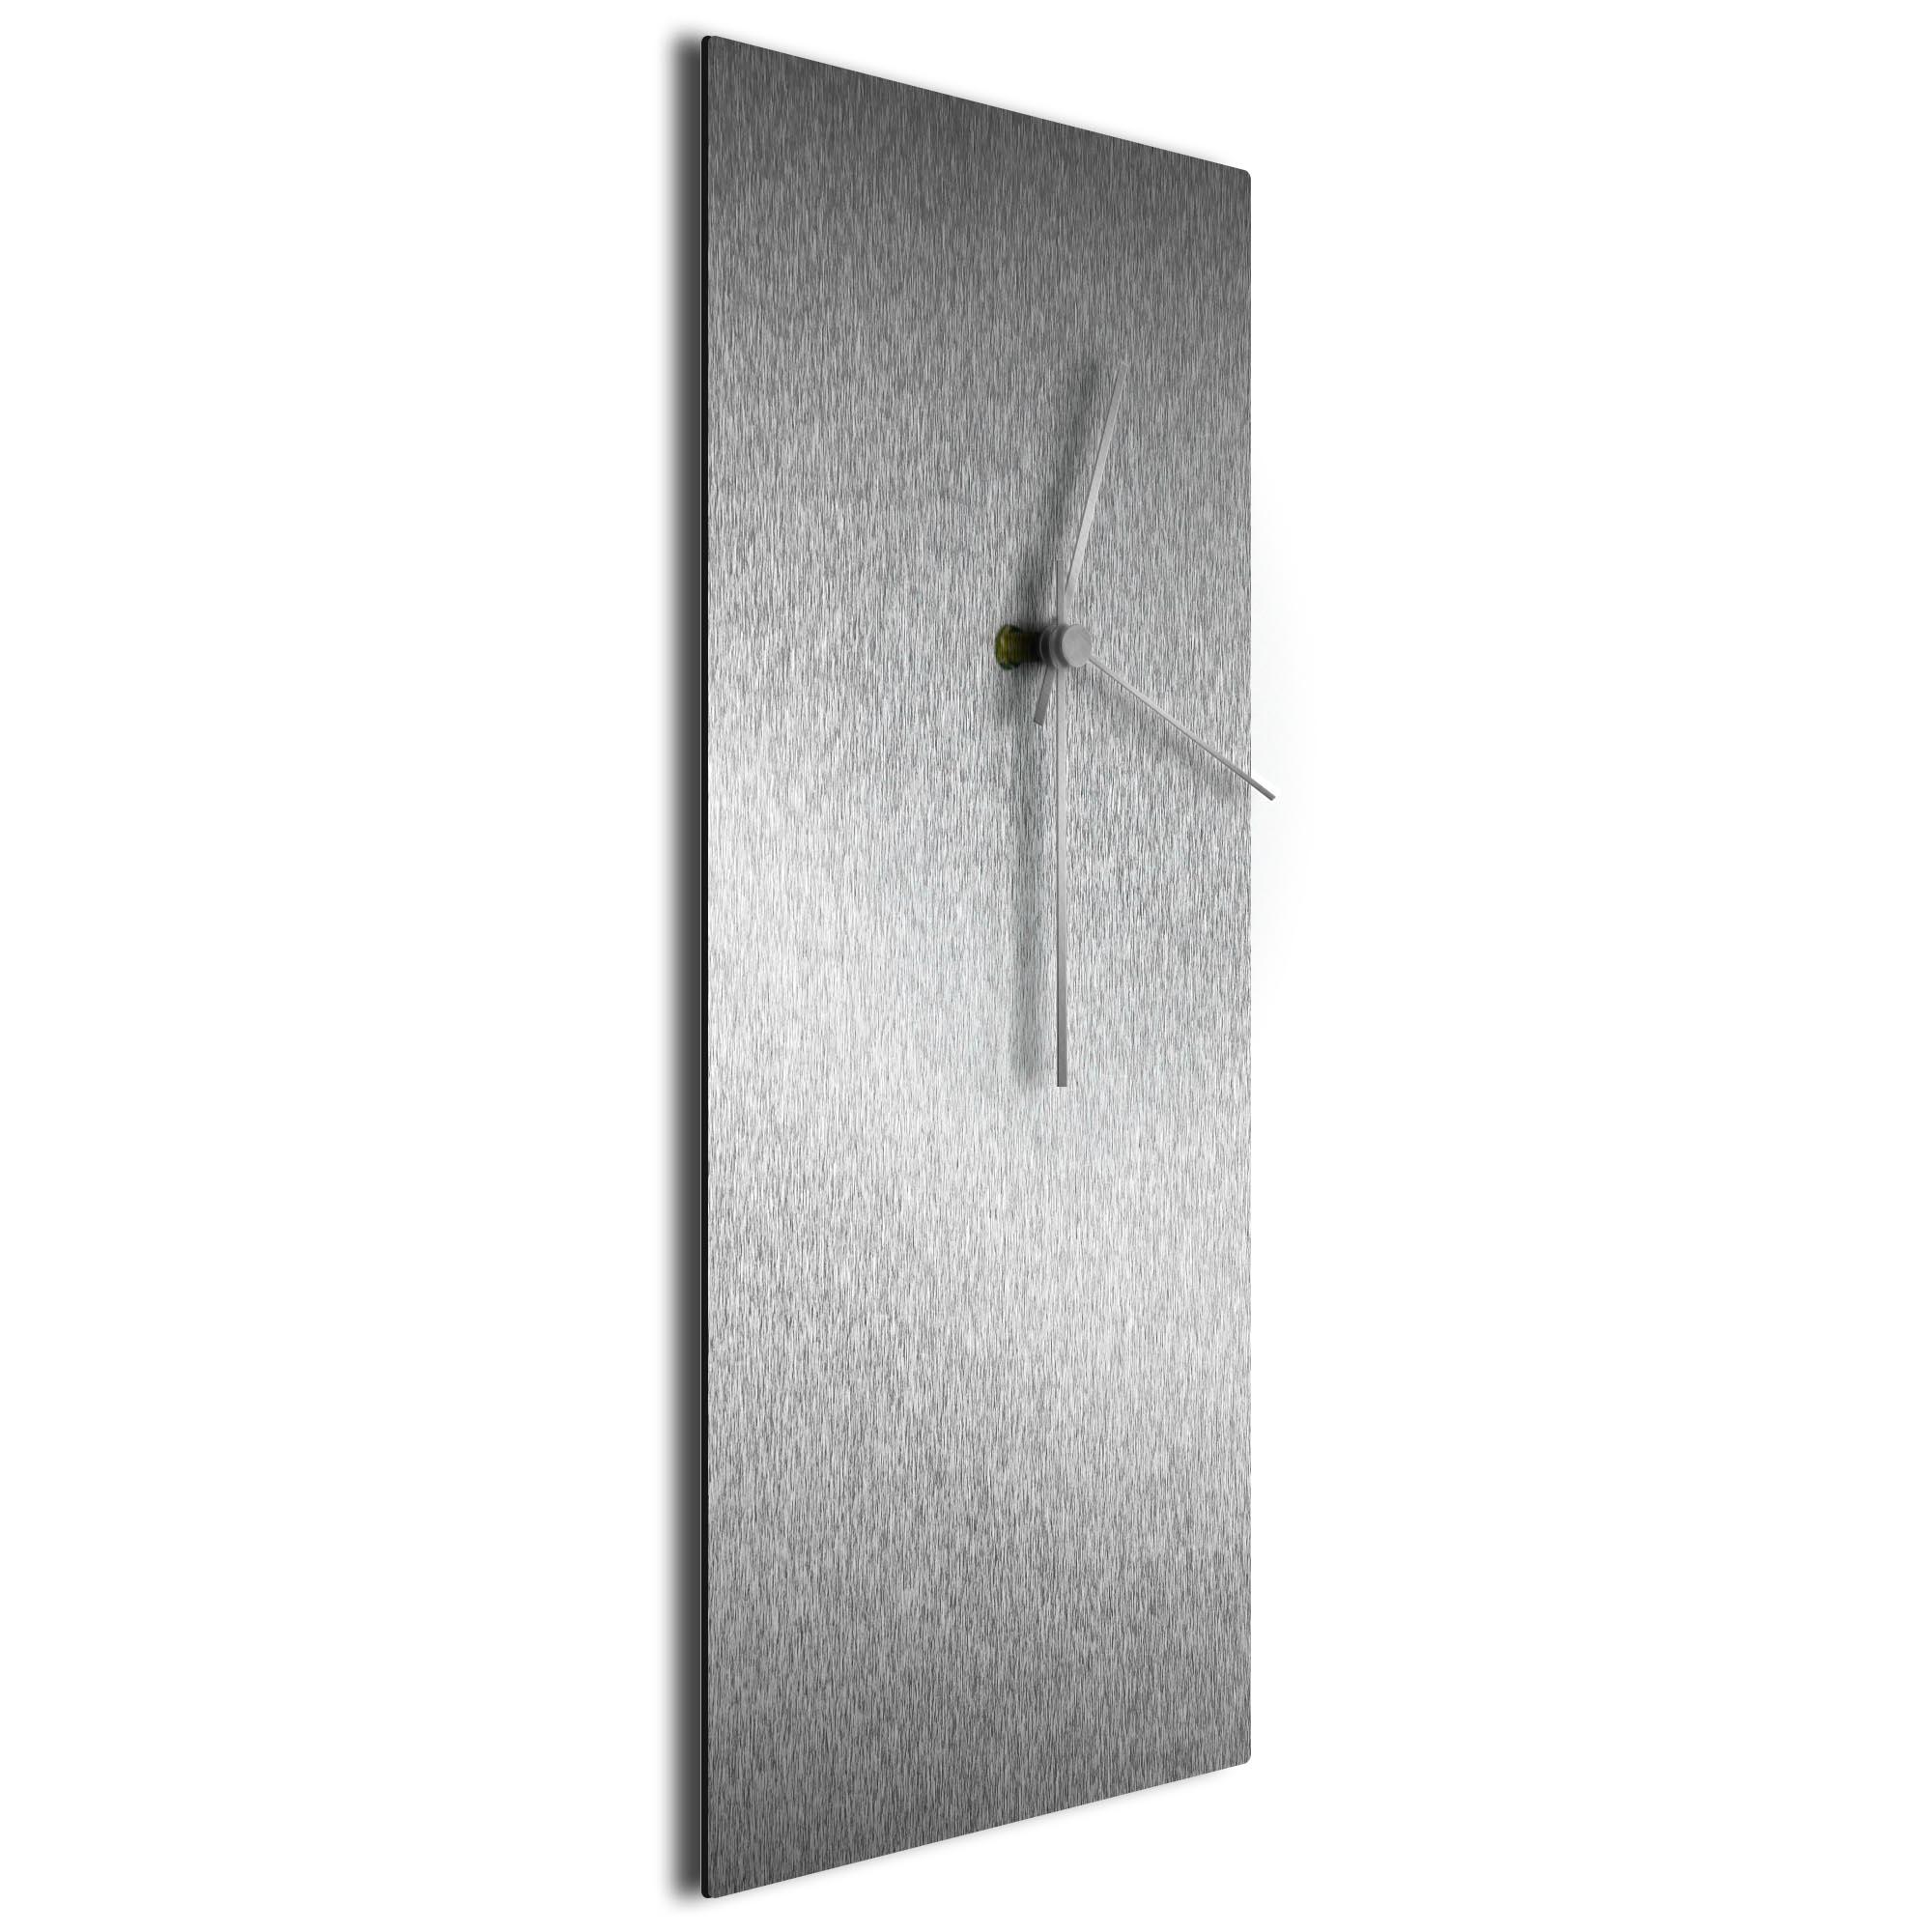 Silversmith Clock Large Silver - Image 2